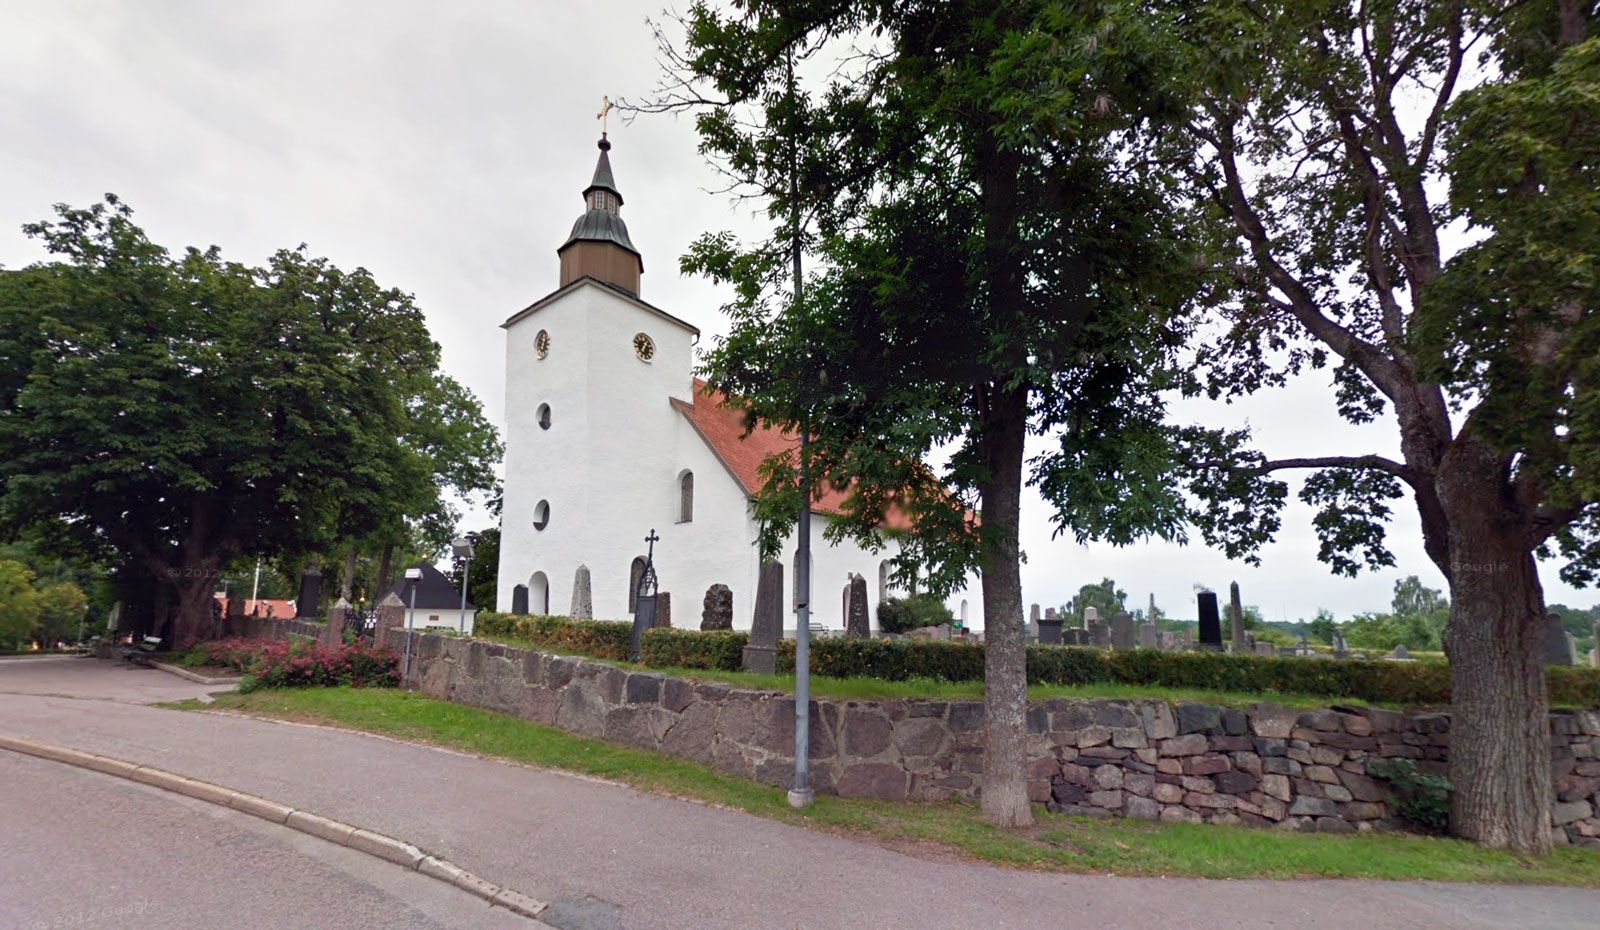 Nils Magnus Gabrielsson - Offentliga medlemsfoton - Ancestry